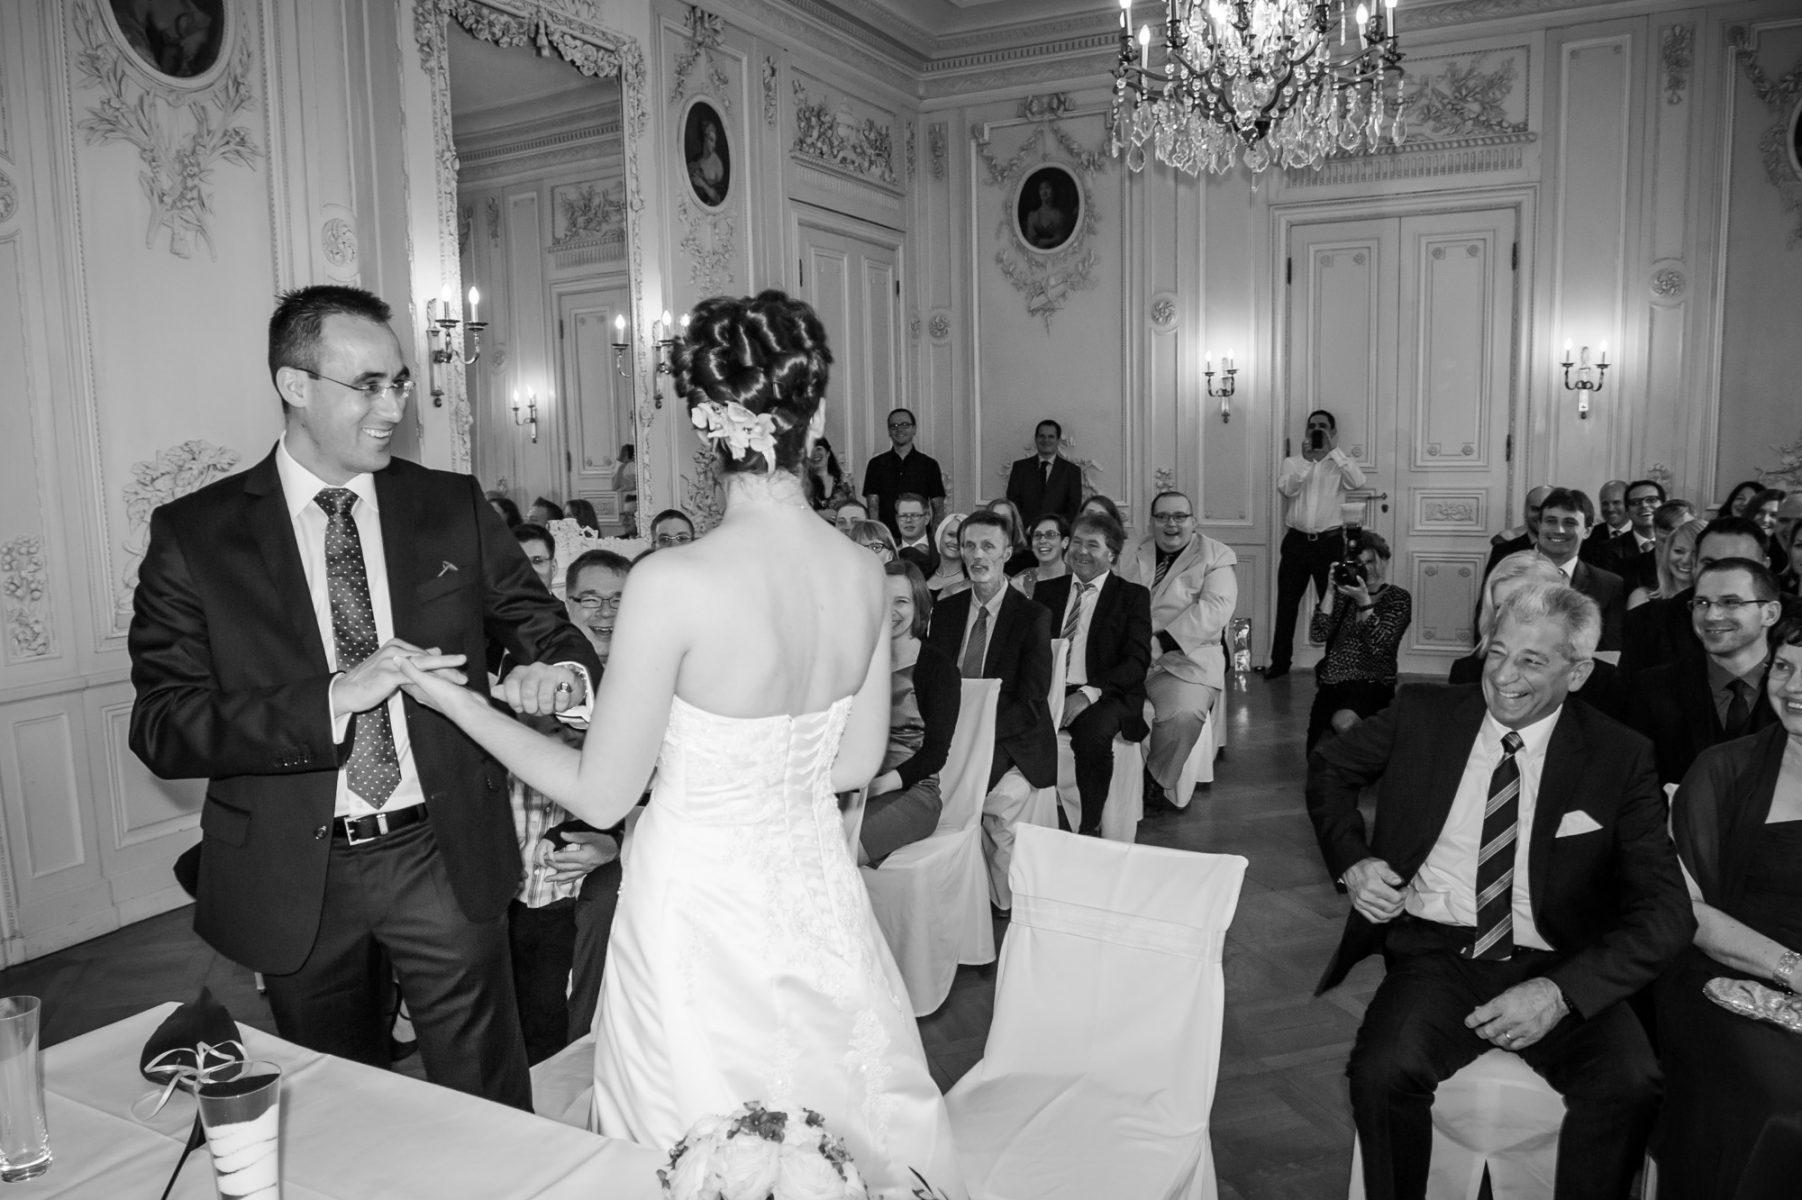 Hochzeit Feier  B2000 2000014 1802x1200 - Trauung